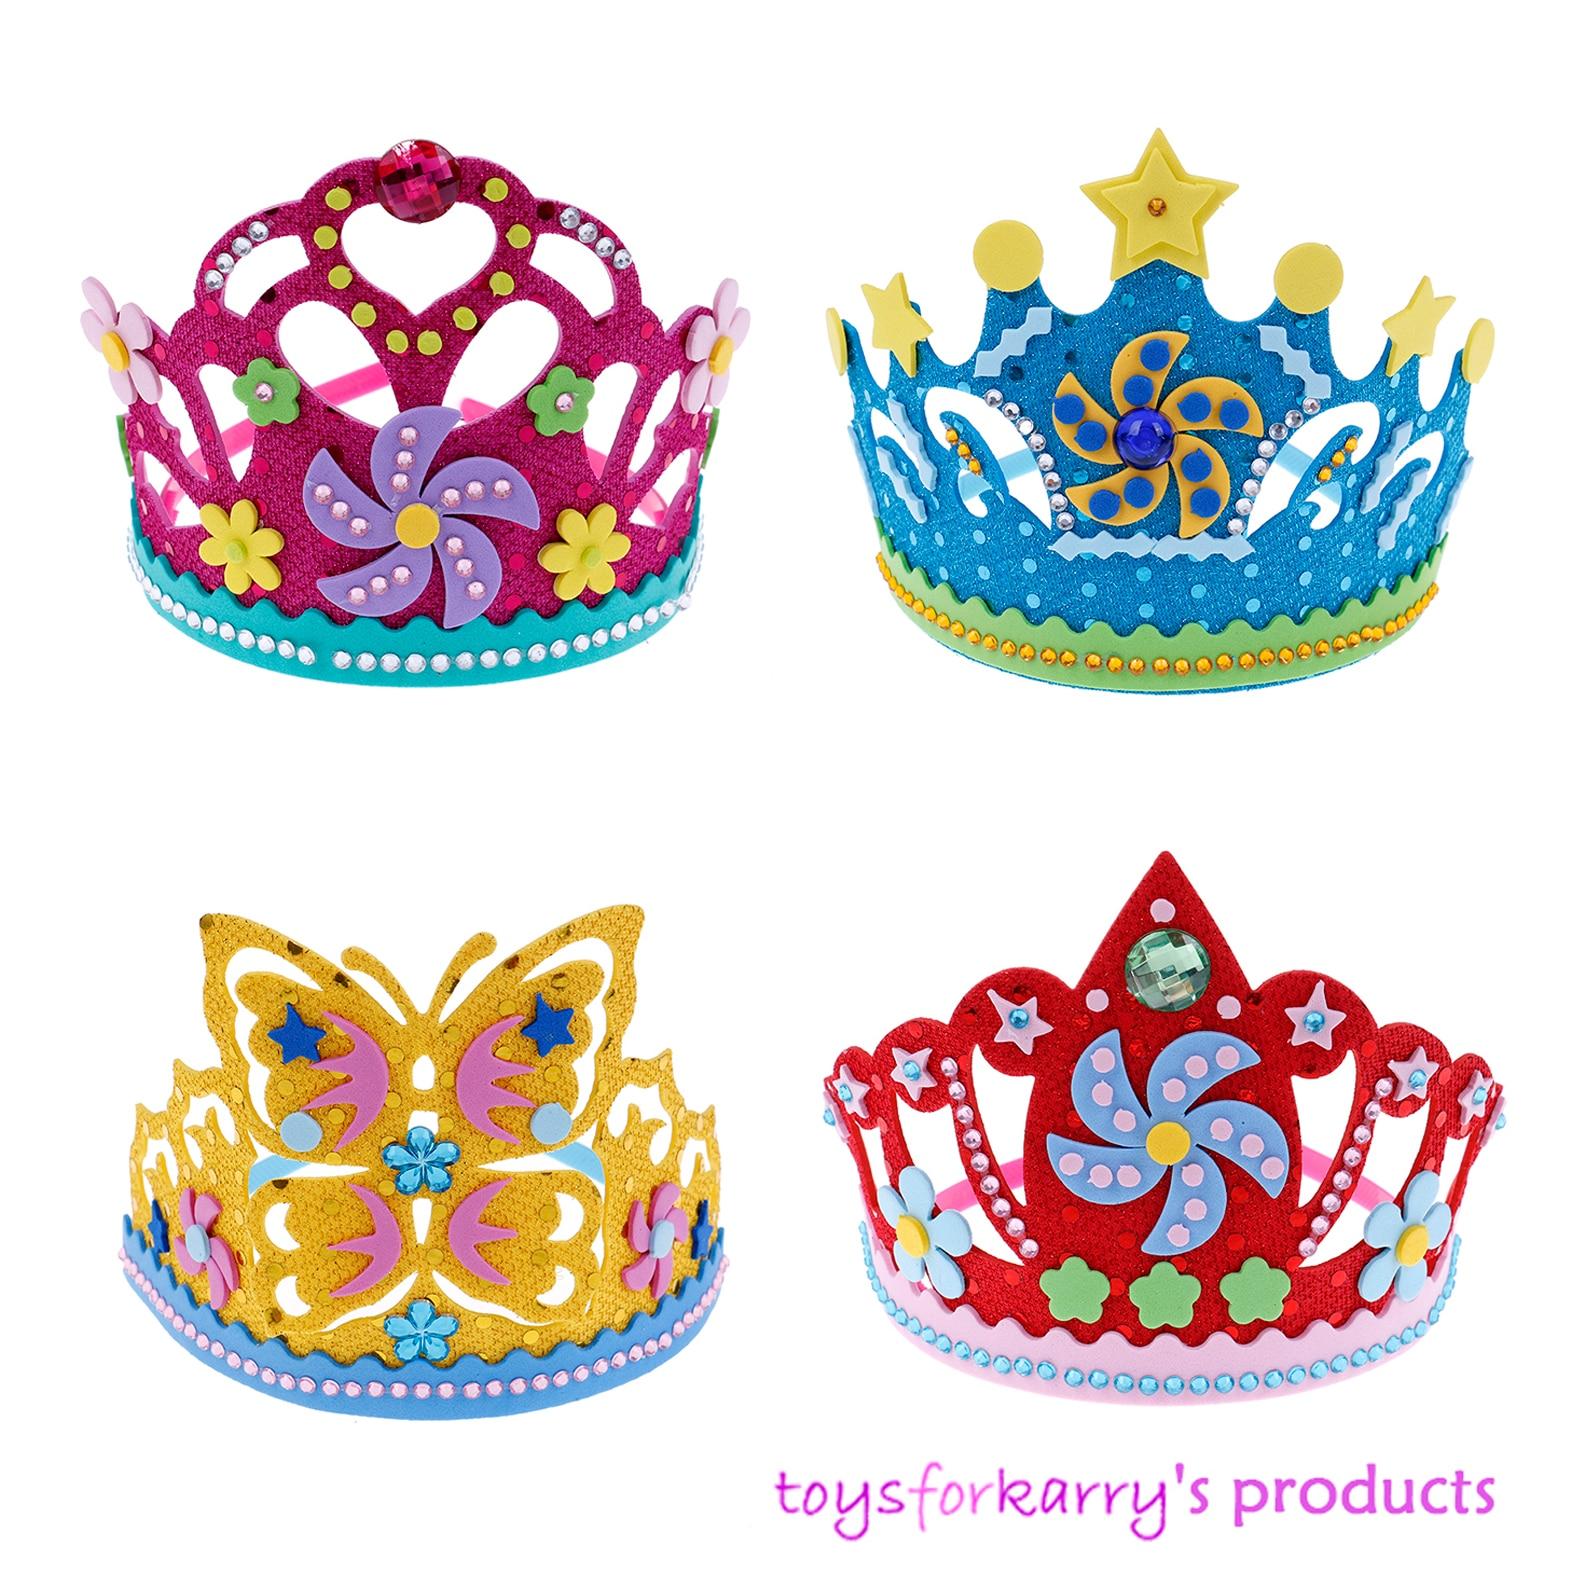 DIY Craft EVA Foam Crown Creative Paper Sequins Flowers Stars Patterns Toys For Children Kindergarten Art Party Decorations Gift